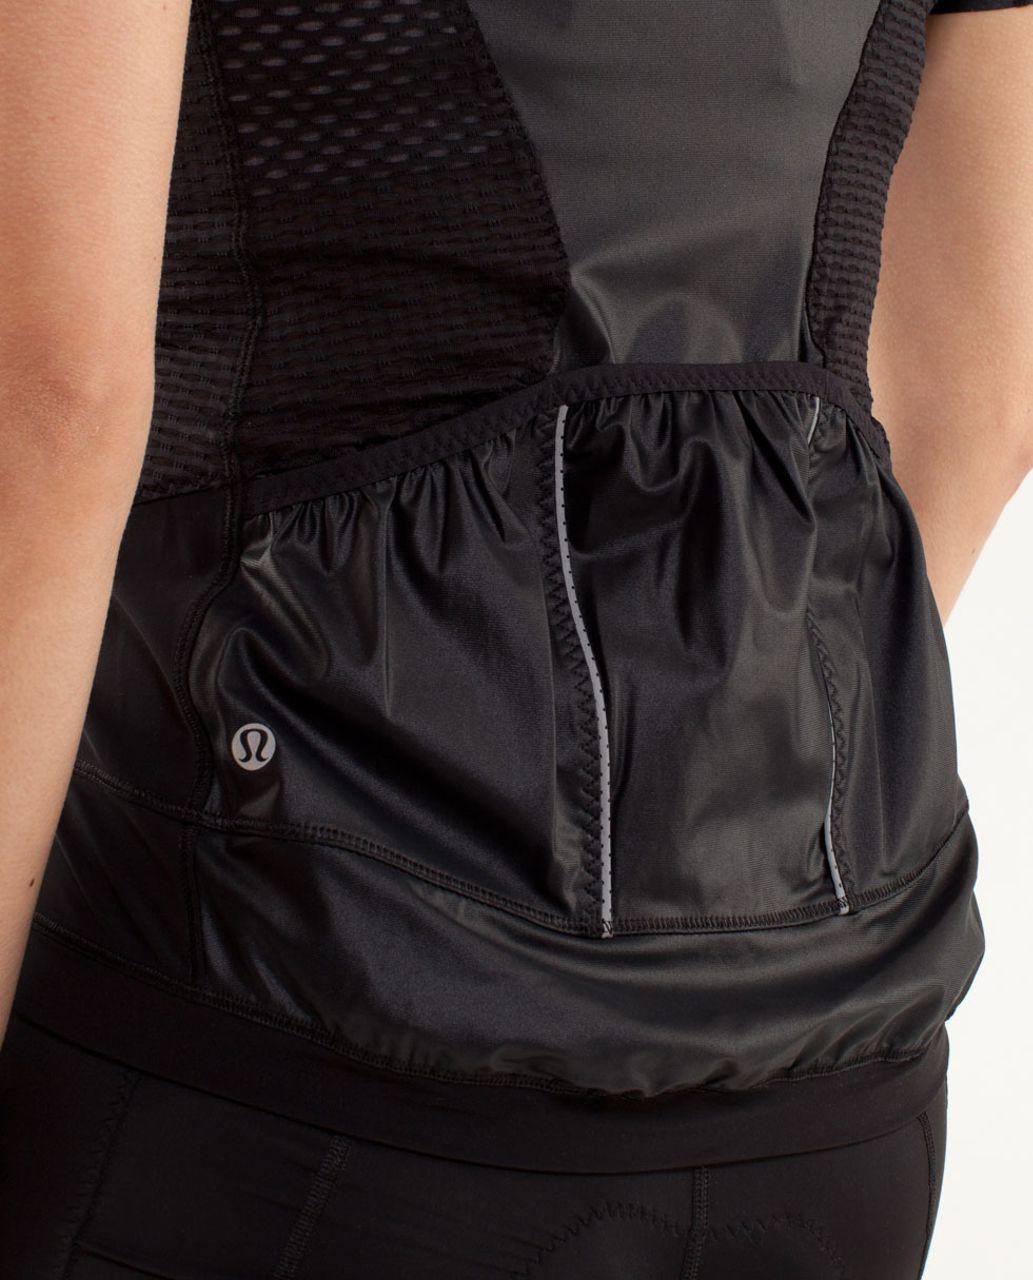 Lululemon Paceline Jersey - Black